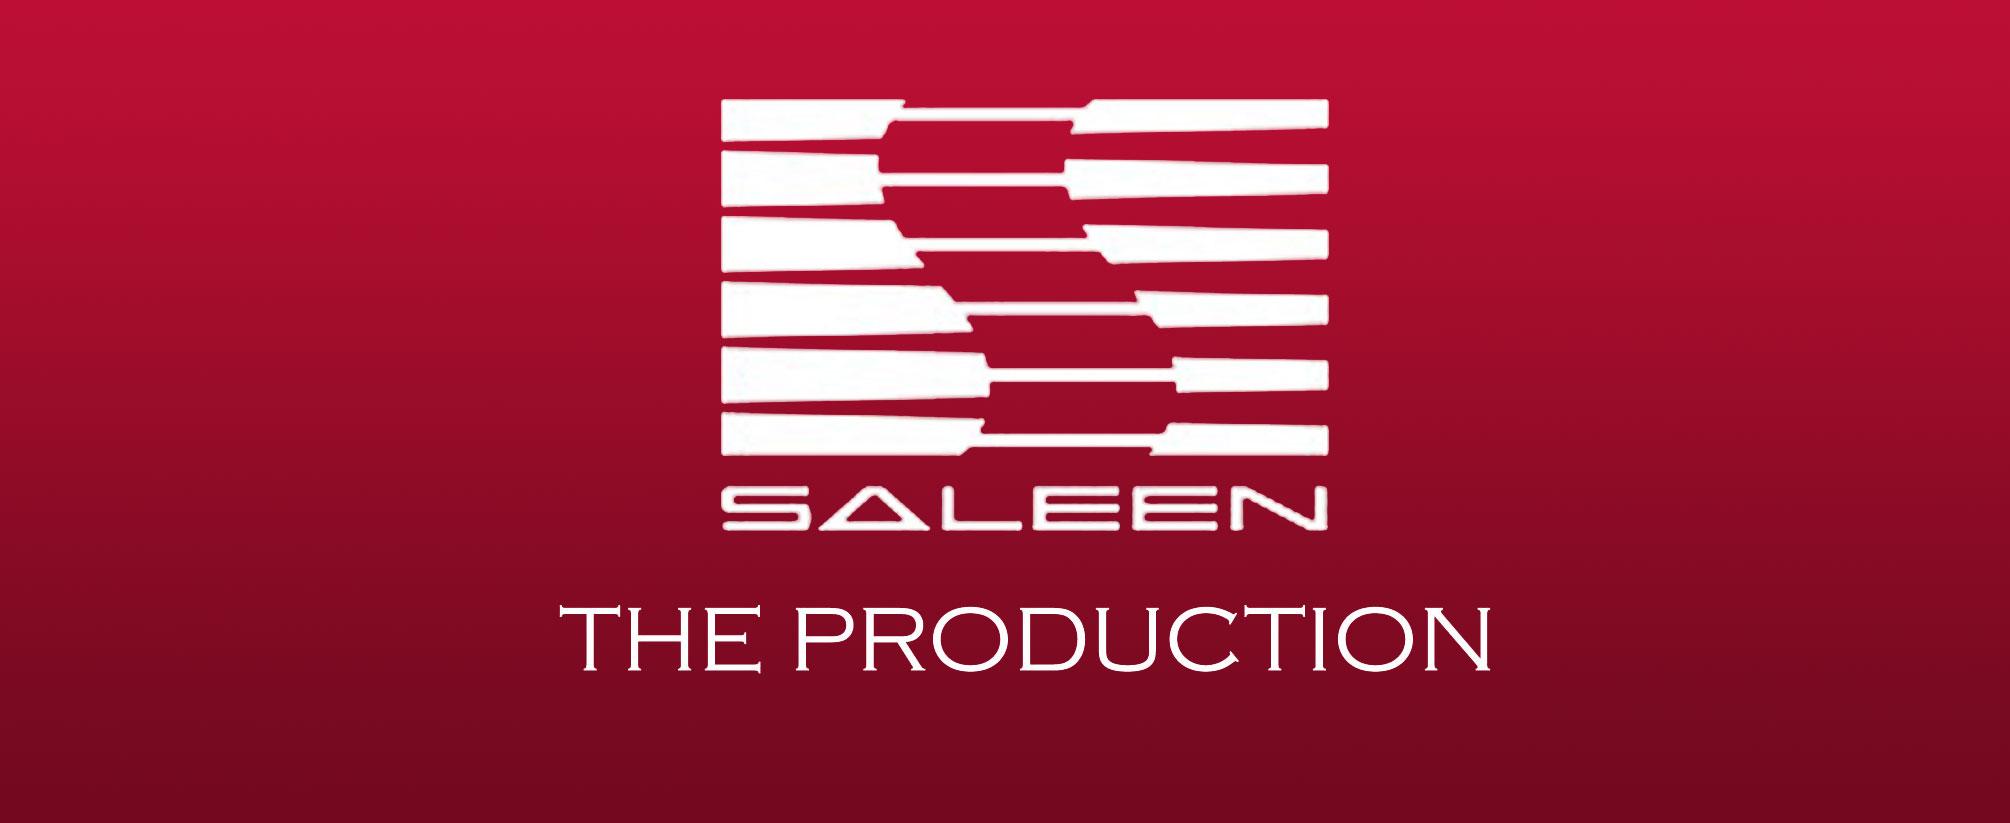 Saleen The Production Mustangmania It